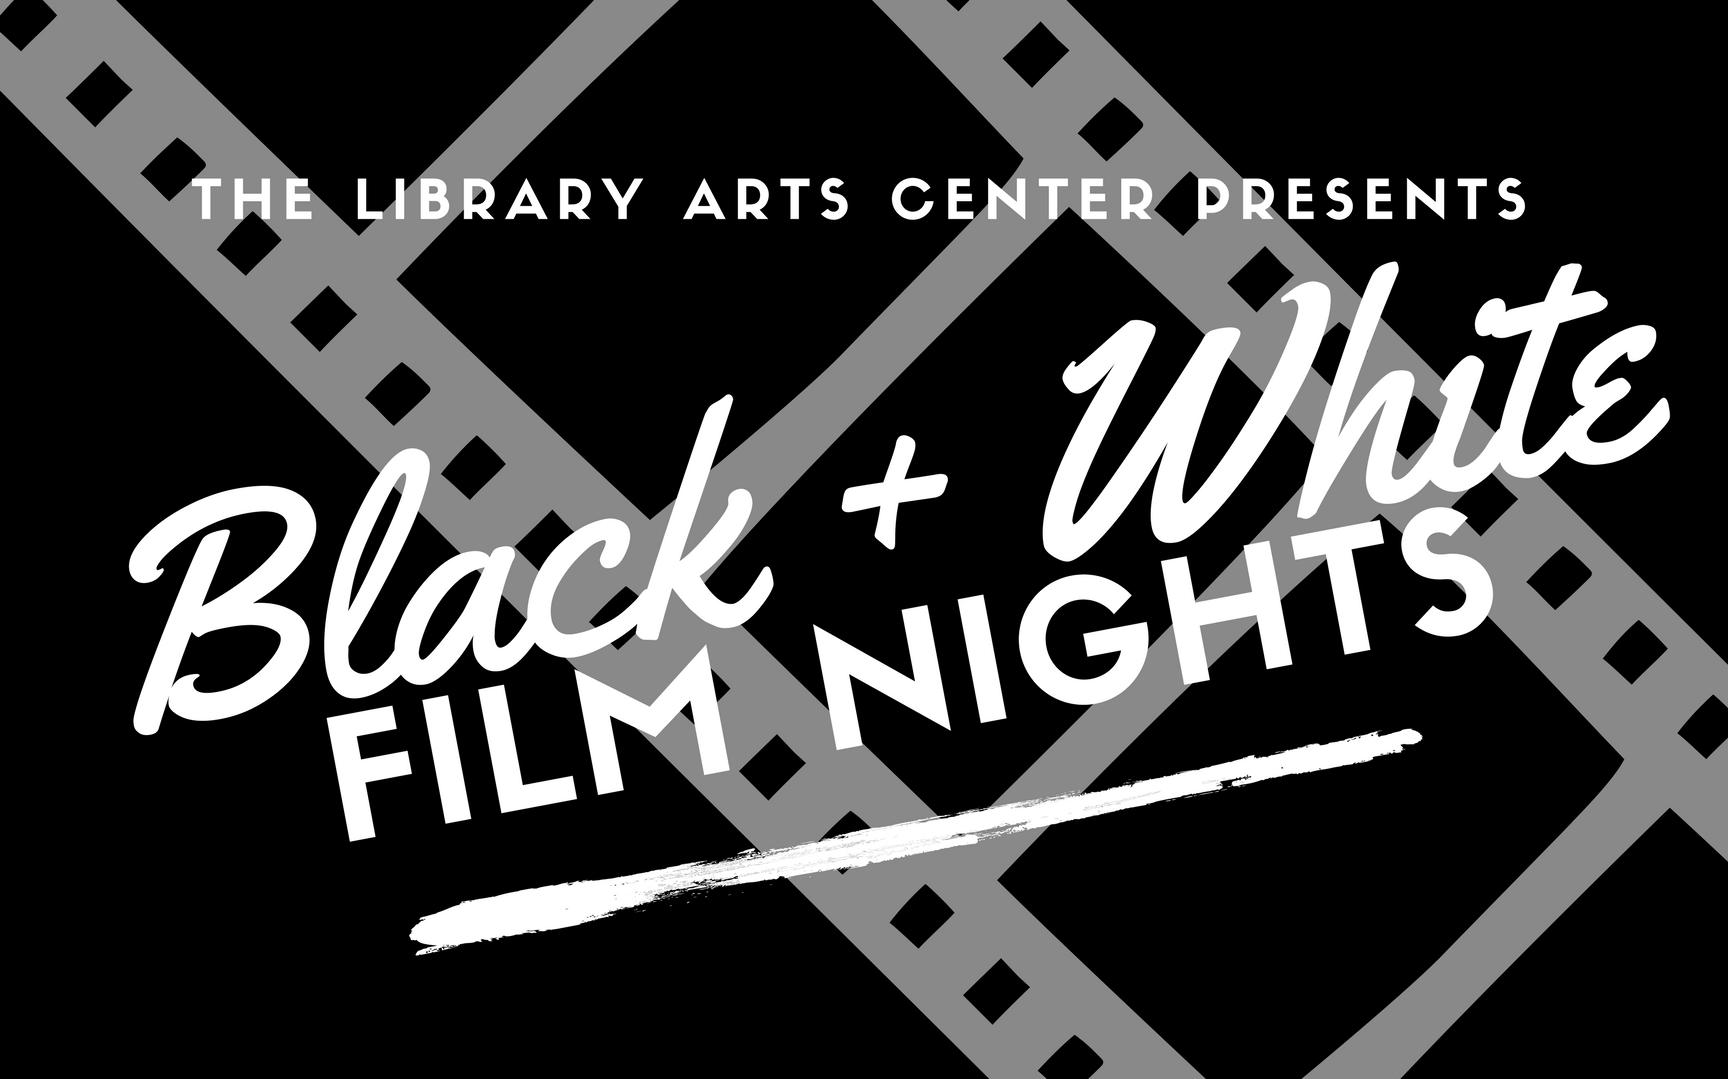 Black + White Film Fridays